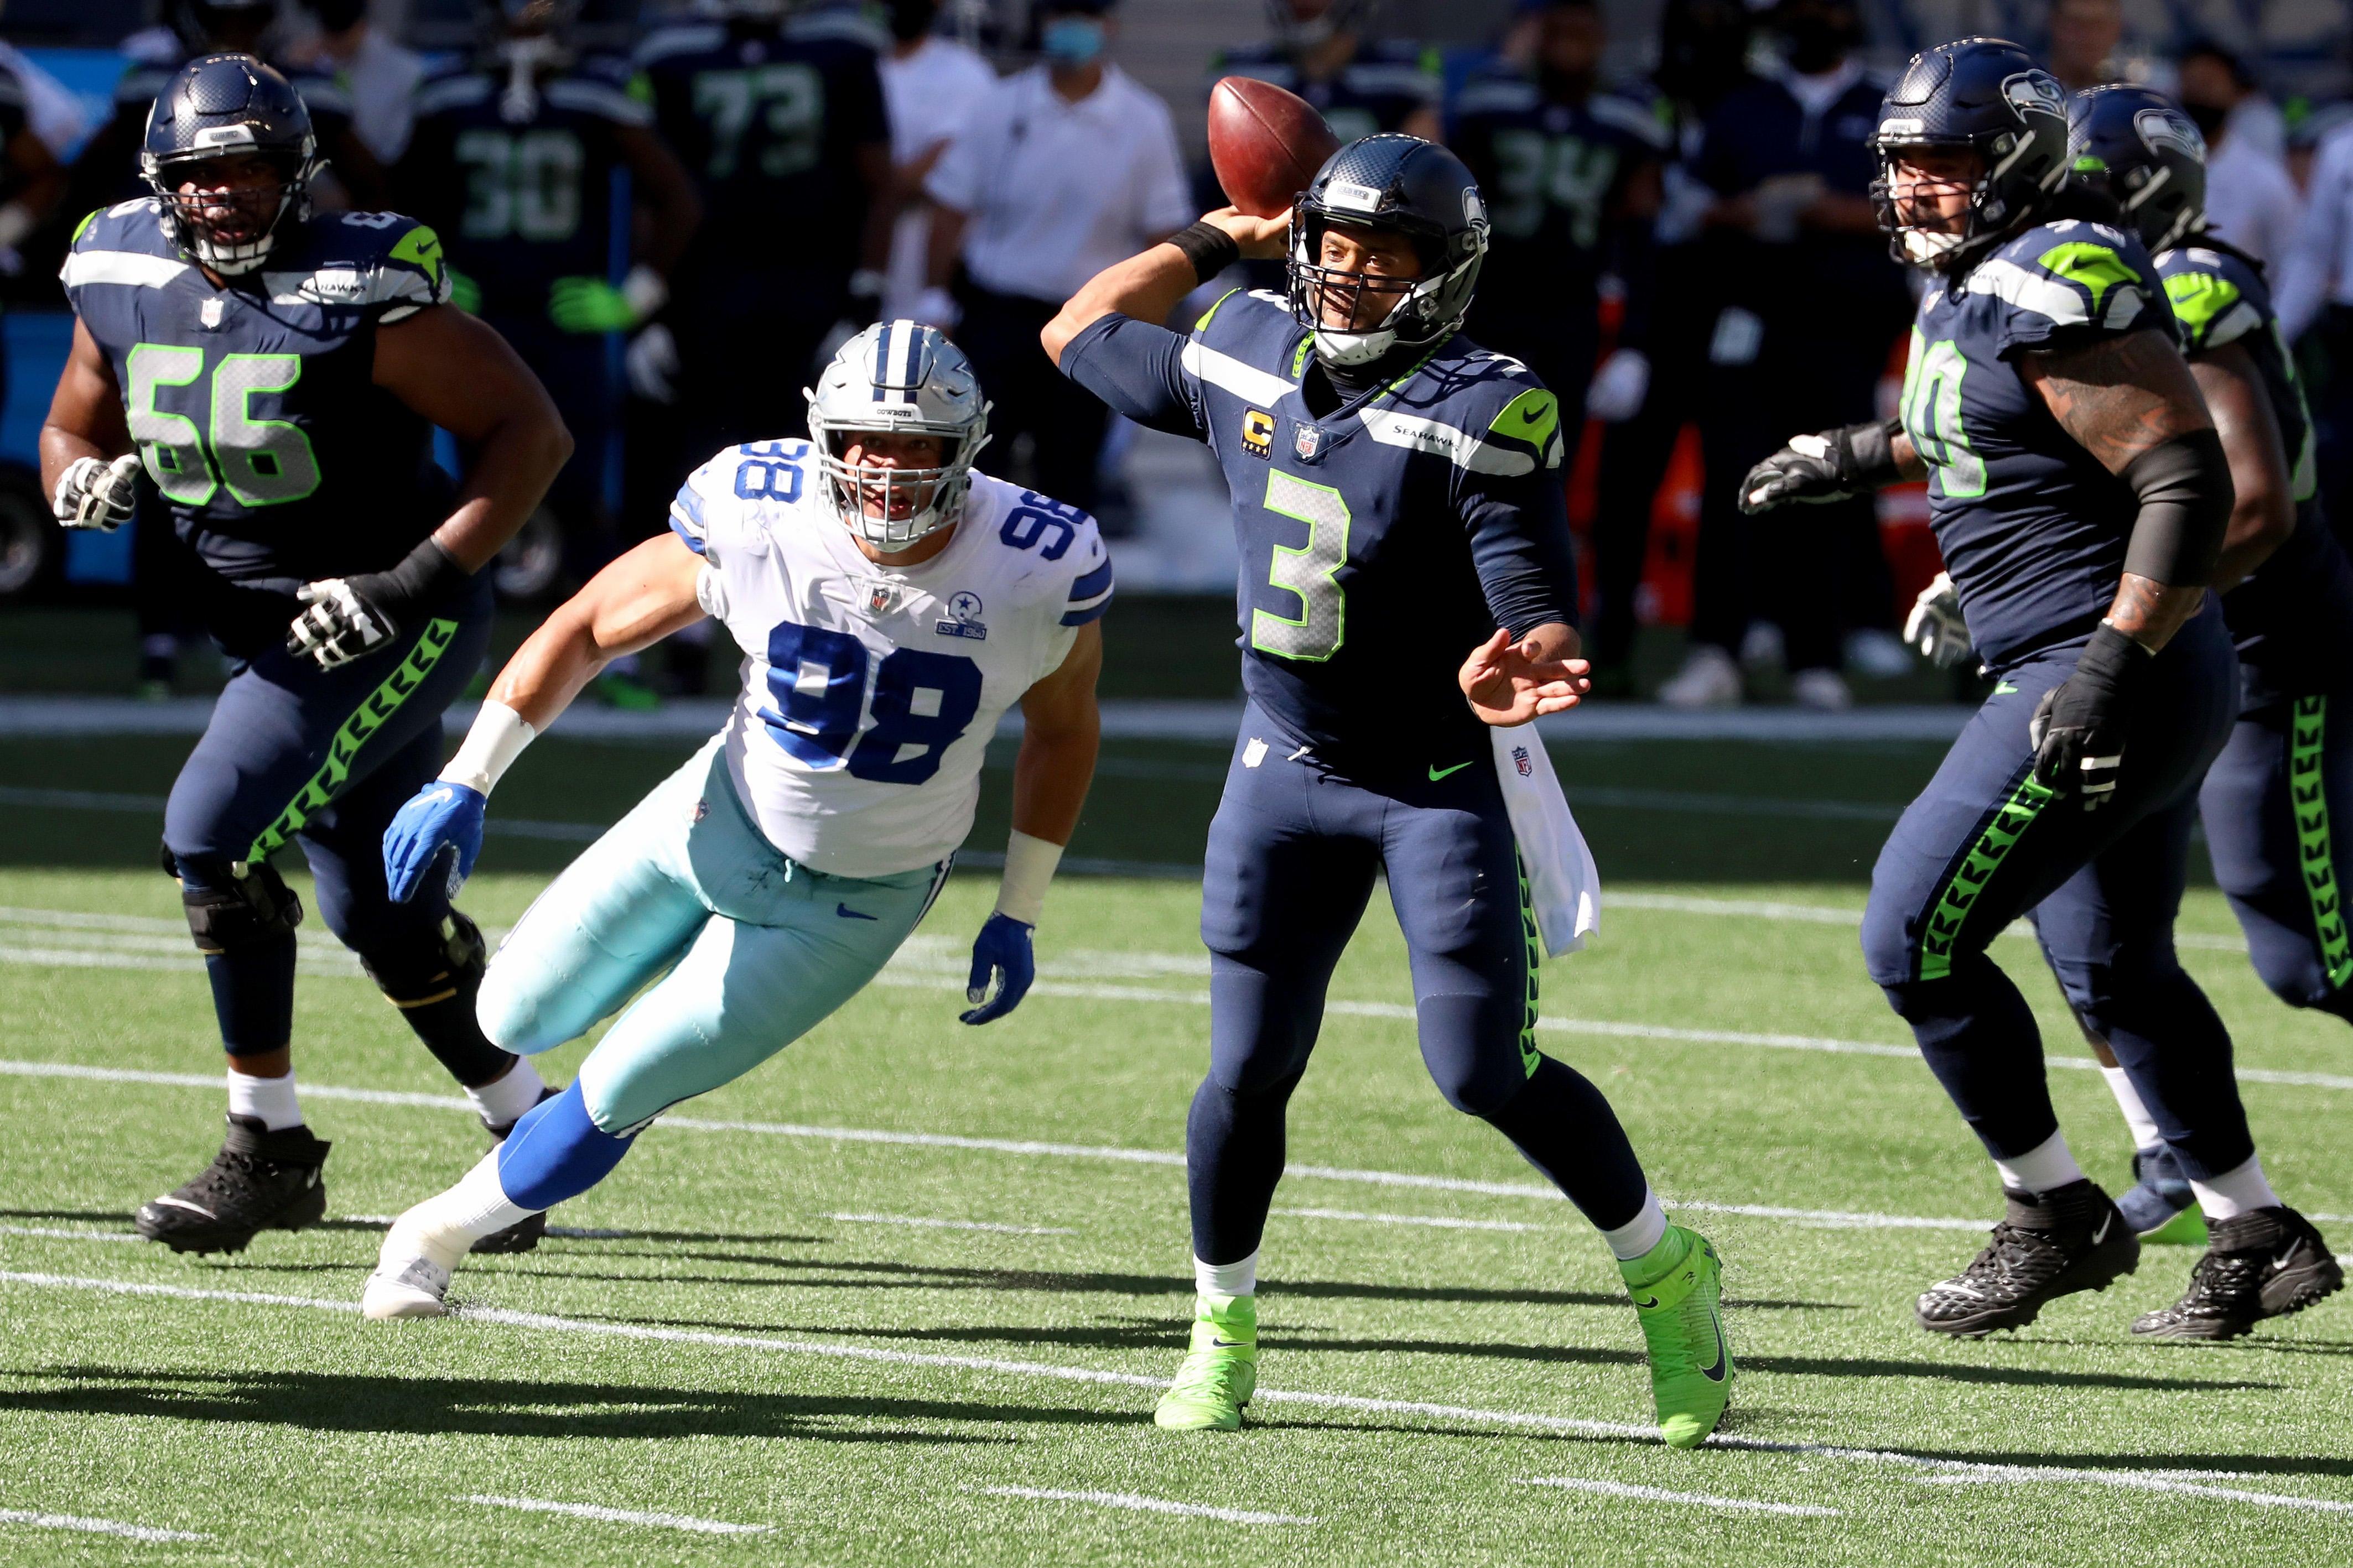 Cowboys Vs Seahawks Final Score Russell Wilson Wins Nfc Shootout Outshines Gritty Dak Prescott Performance Cbssports Com